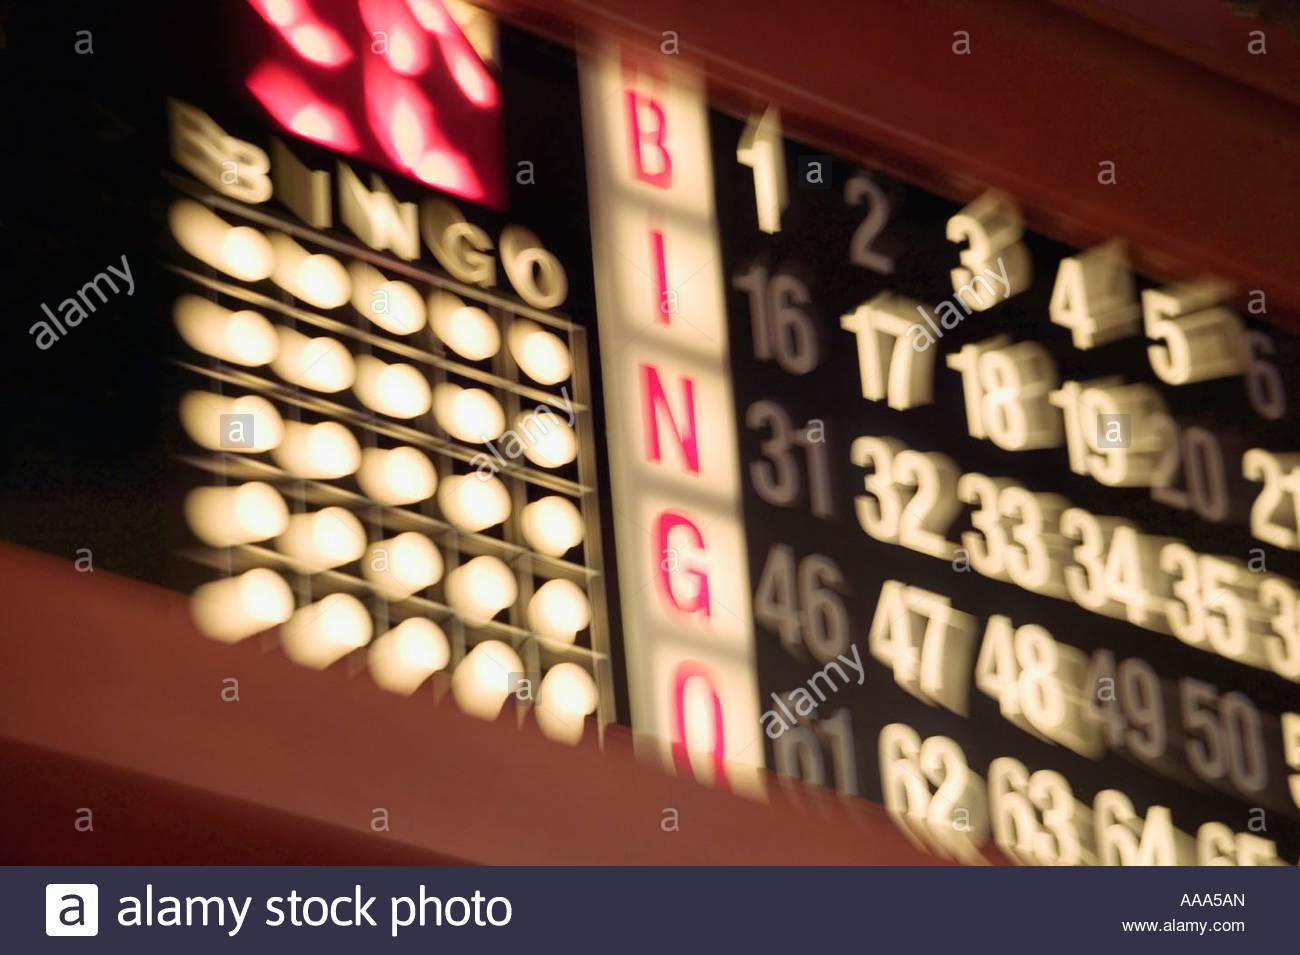 Blurred bingo board - Stock Image